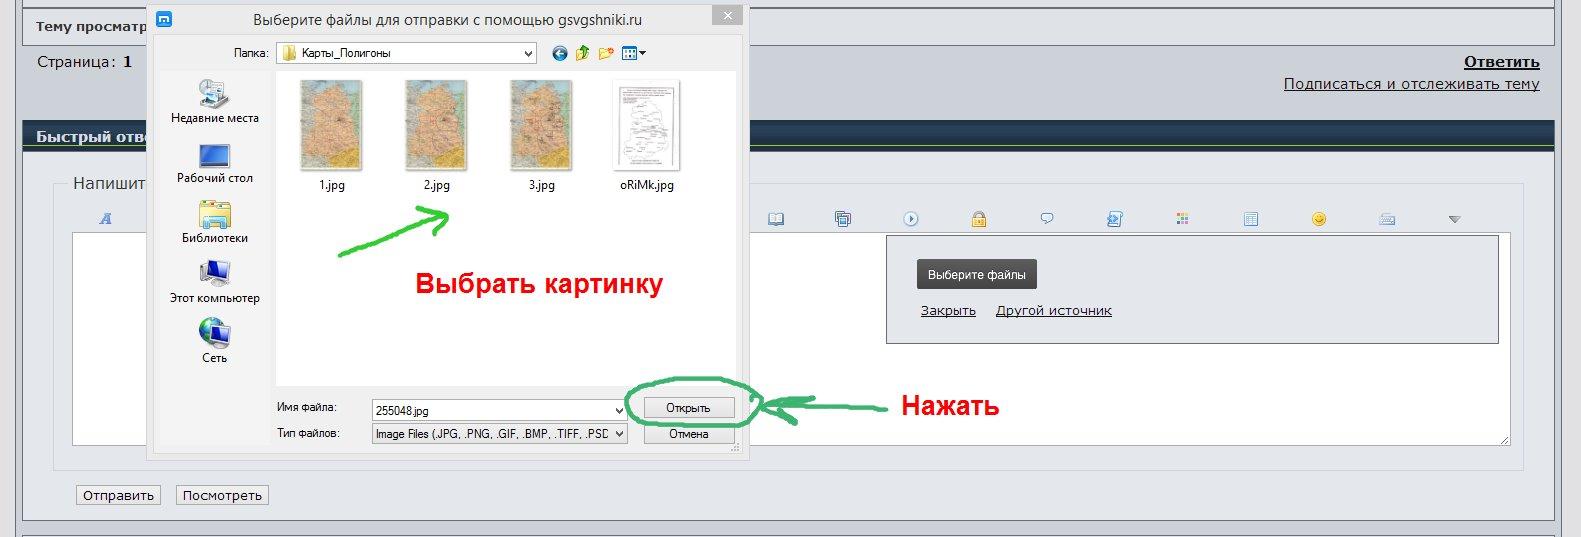 http://s7.uploads.ru/YlvPm.jpg